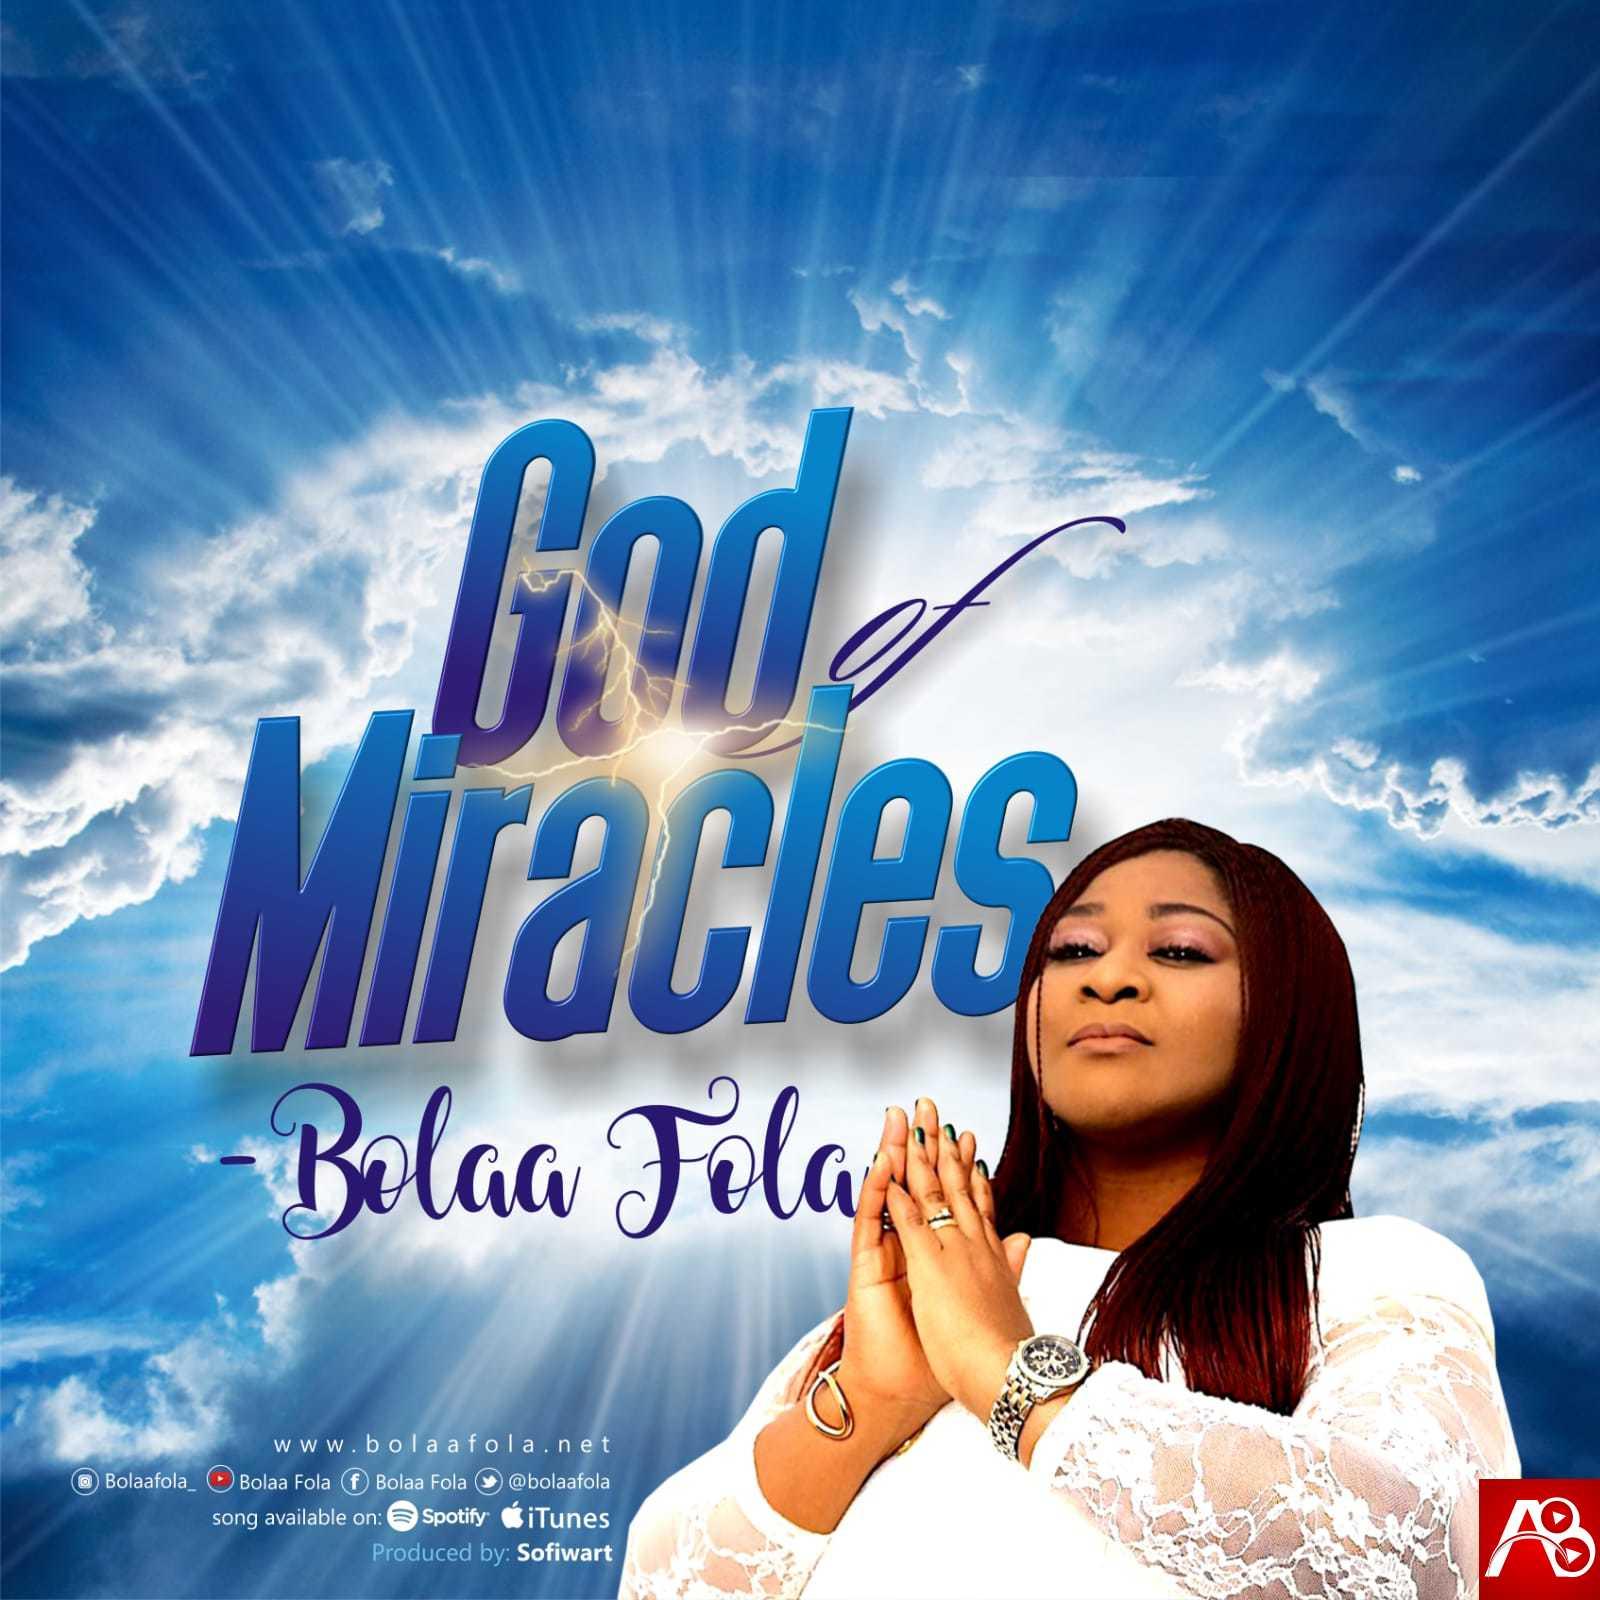 Bolaafola - God of Miracles